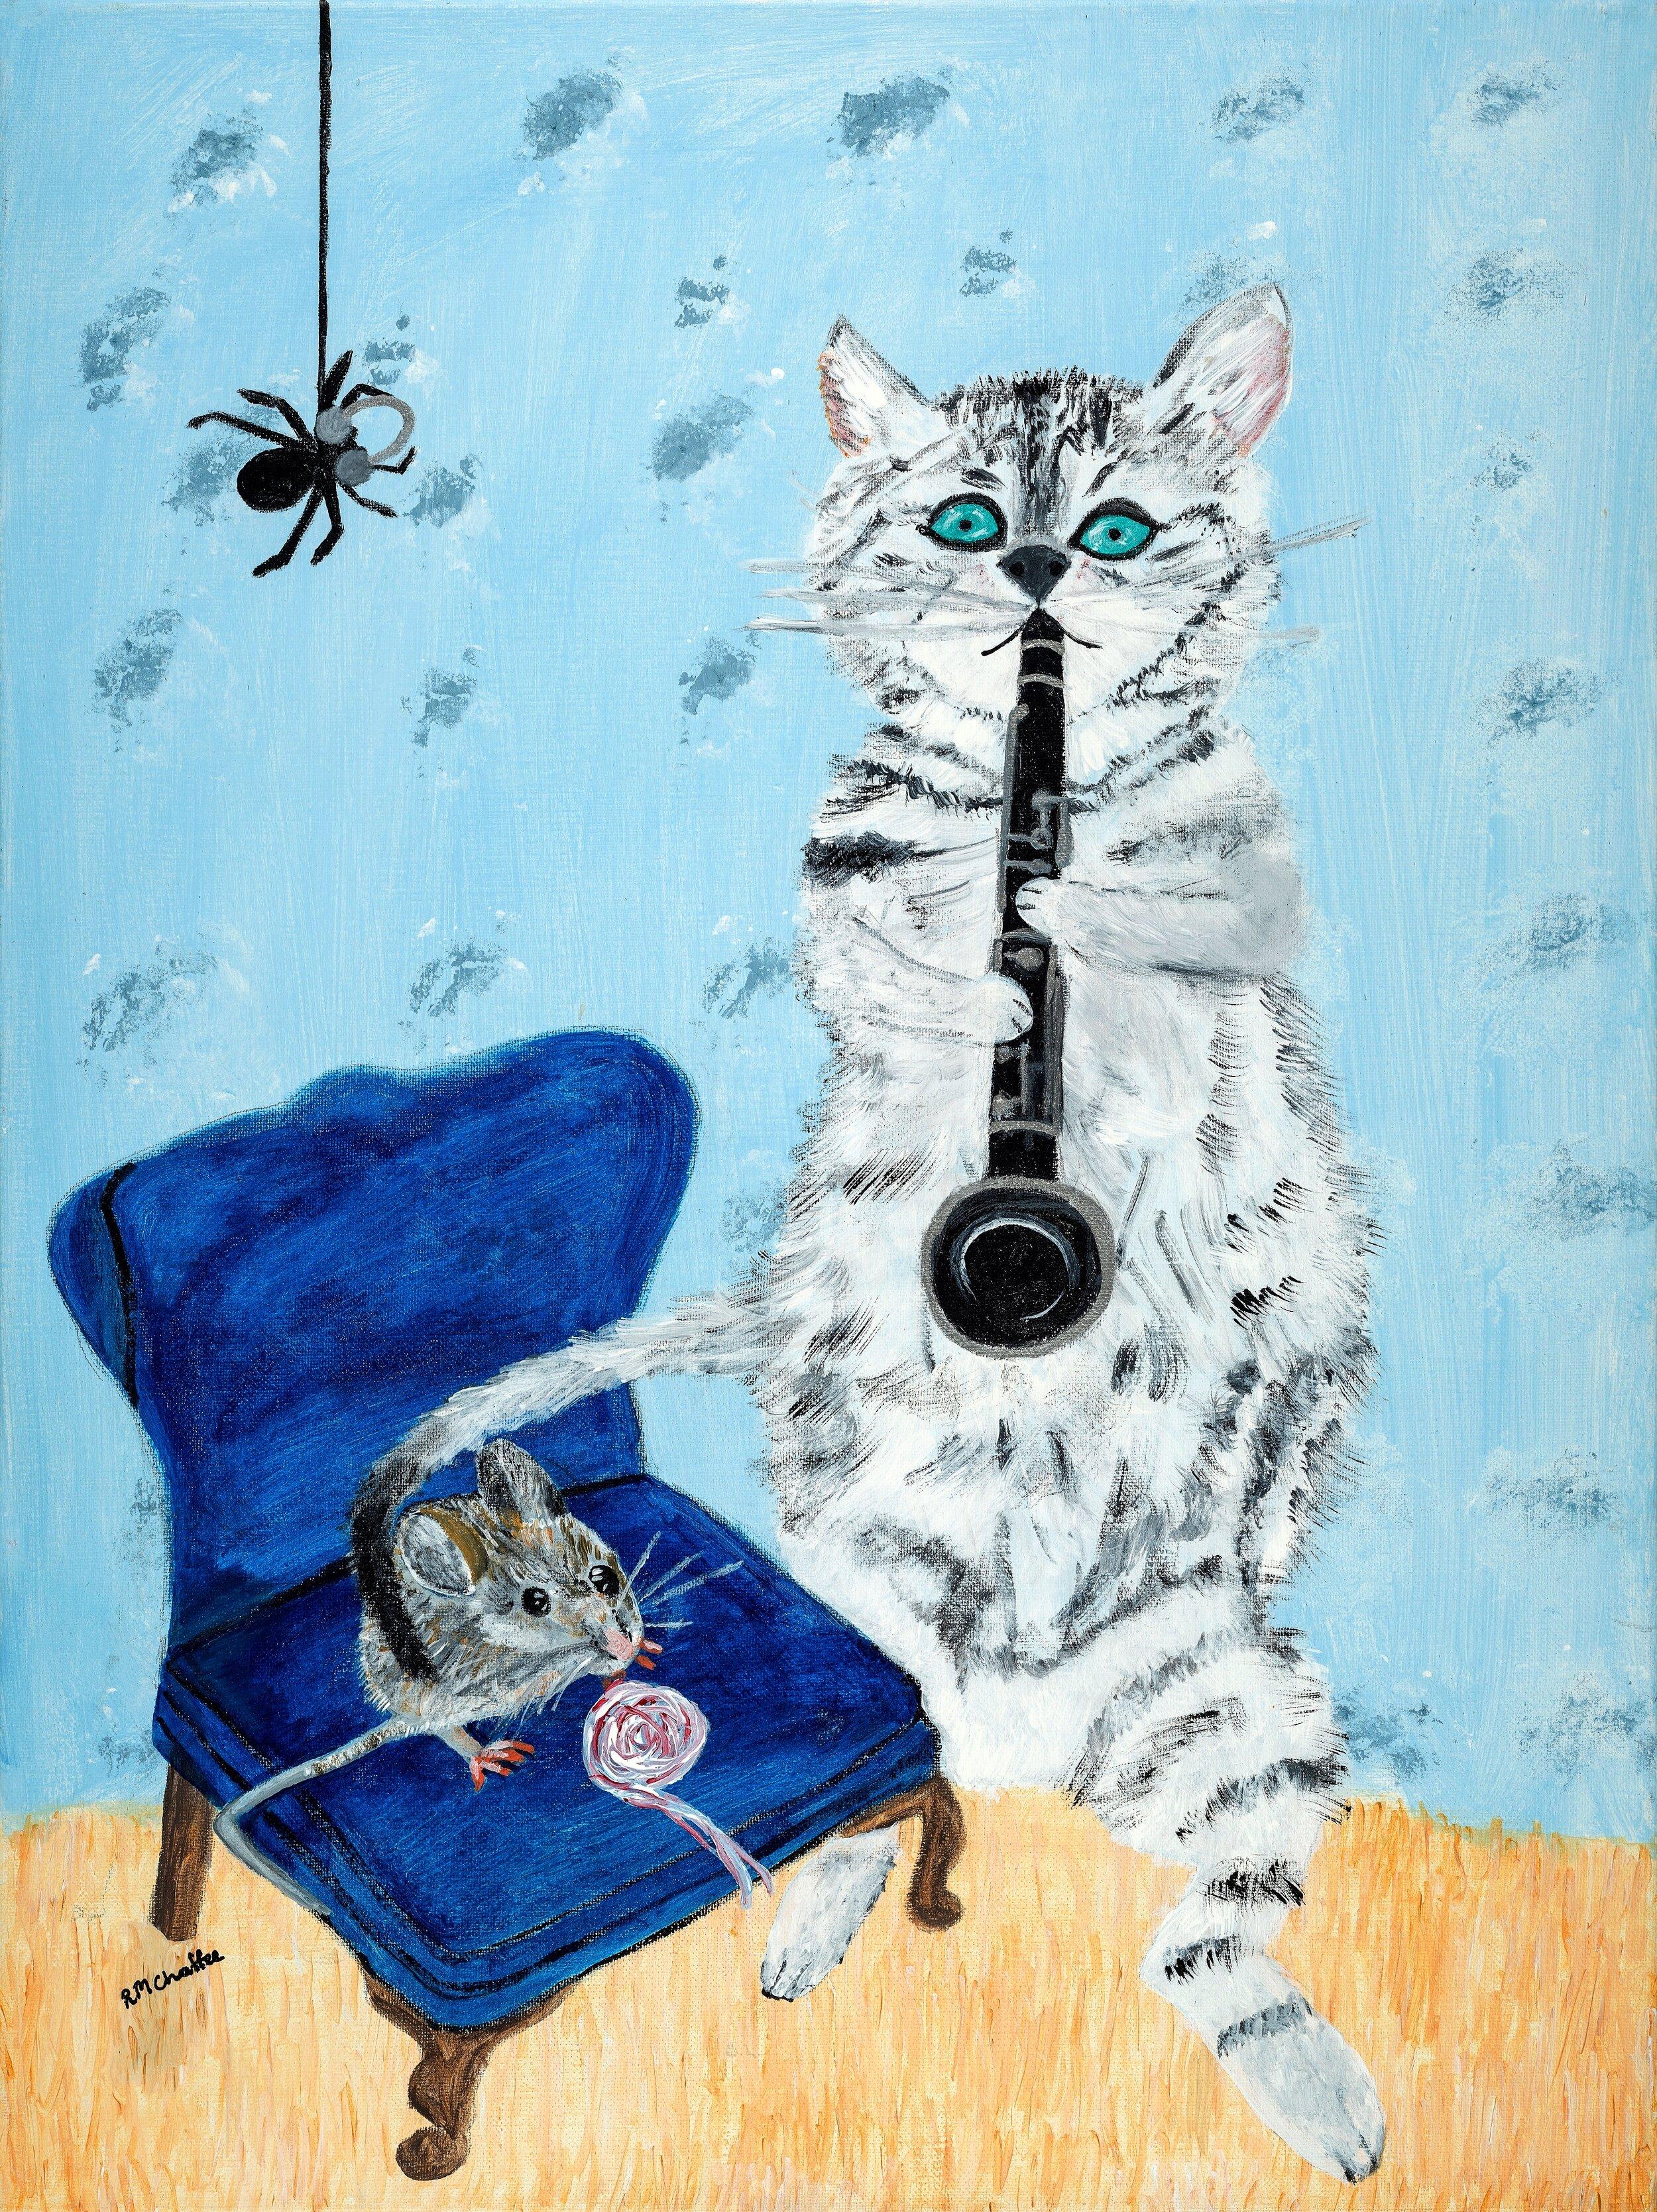 tweek cat clarinet reduced darkened for russell.jpg